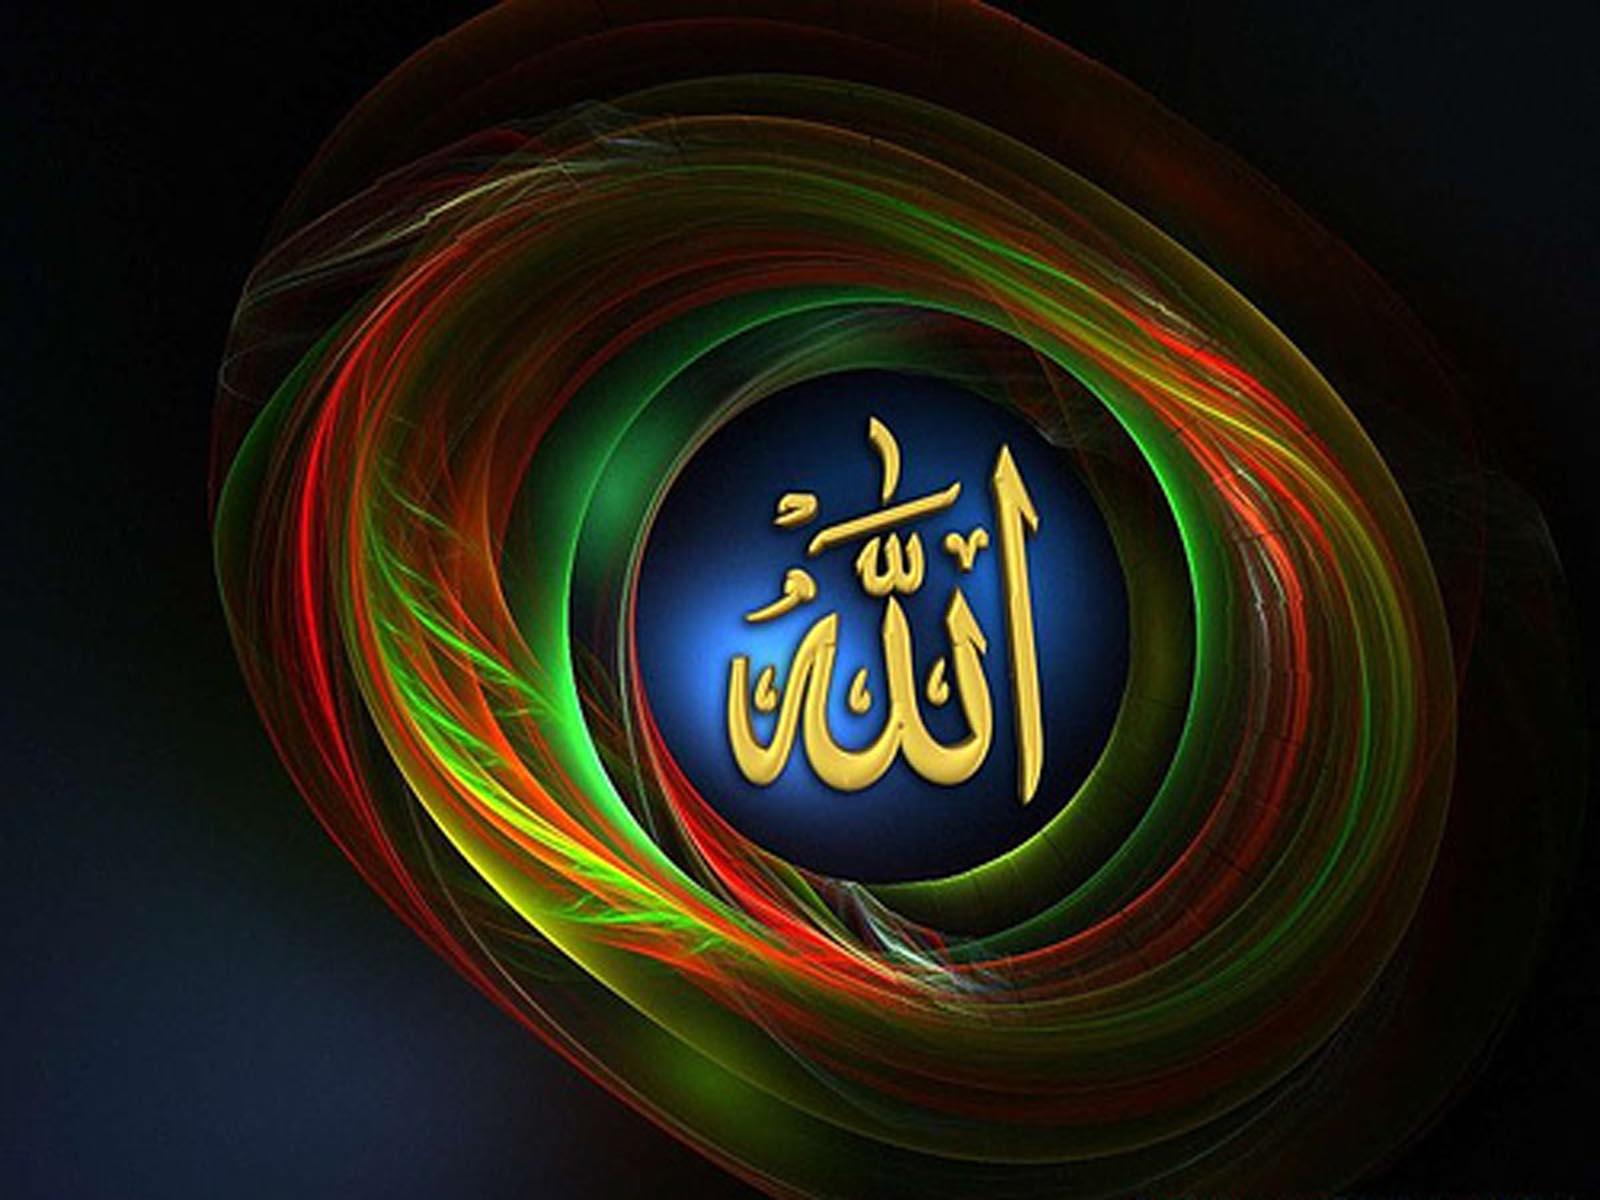 50 beautiful allah names wallpapers on wallpapersafari - A and s name wallpaper ...